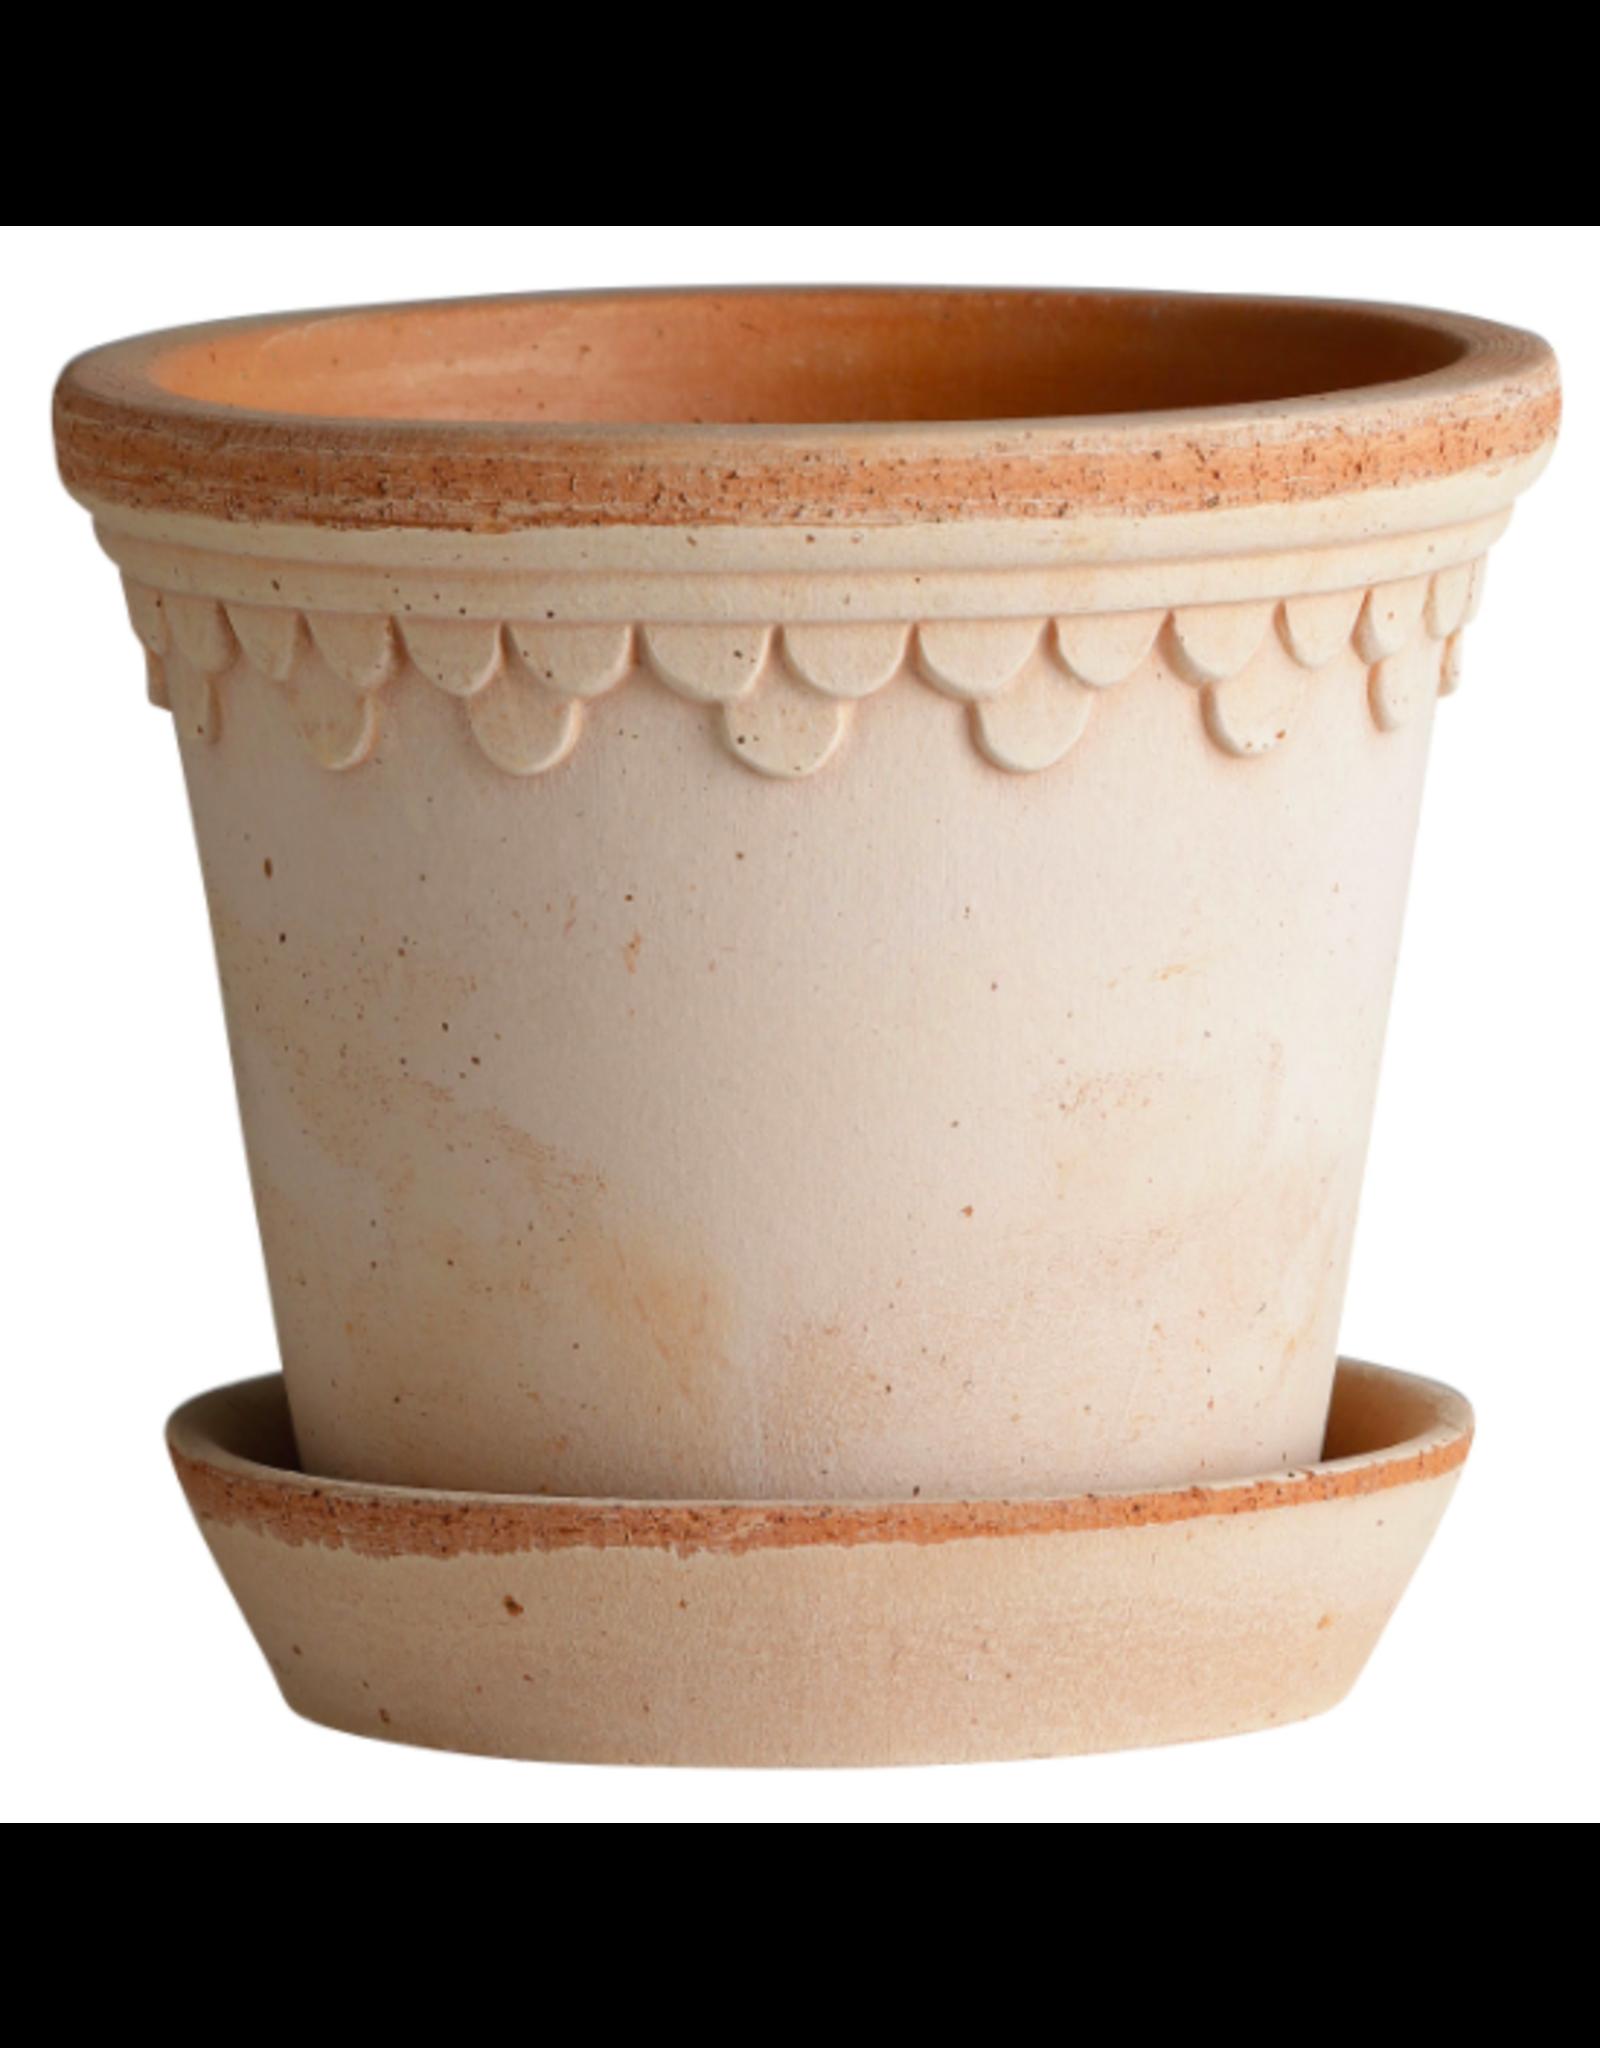 Bergs Potter Copenhagen Pot in Rose + Saucer by Bergs Potter